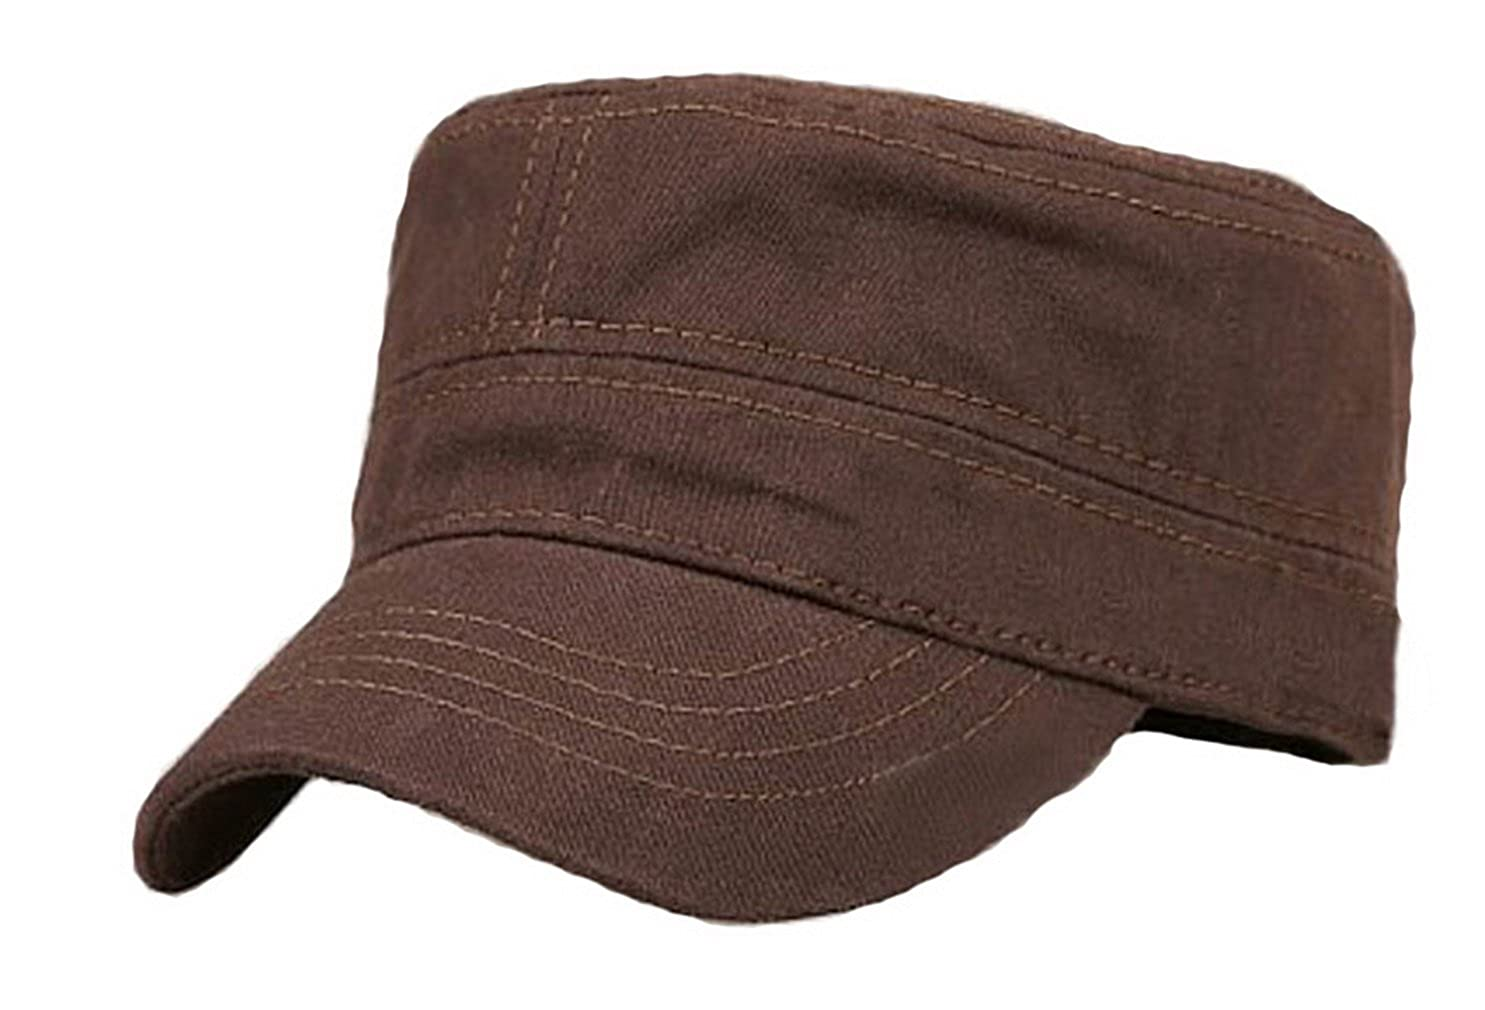 Brcus Solid Peaked Flat Top Cap Army Cadet Classical Military Hat Baseball Cap